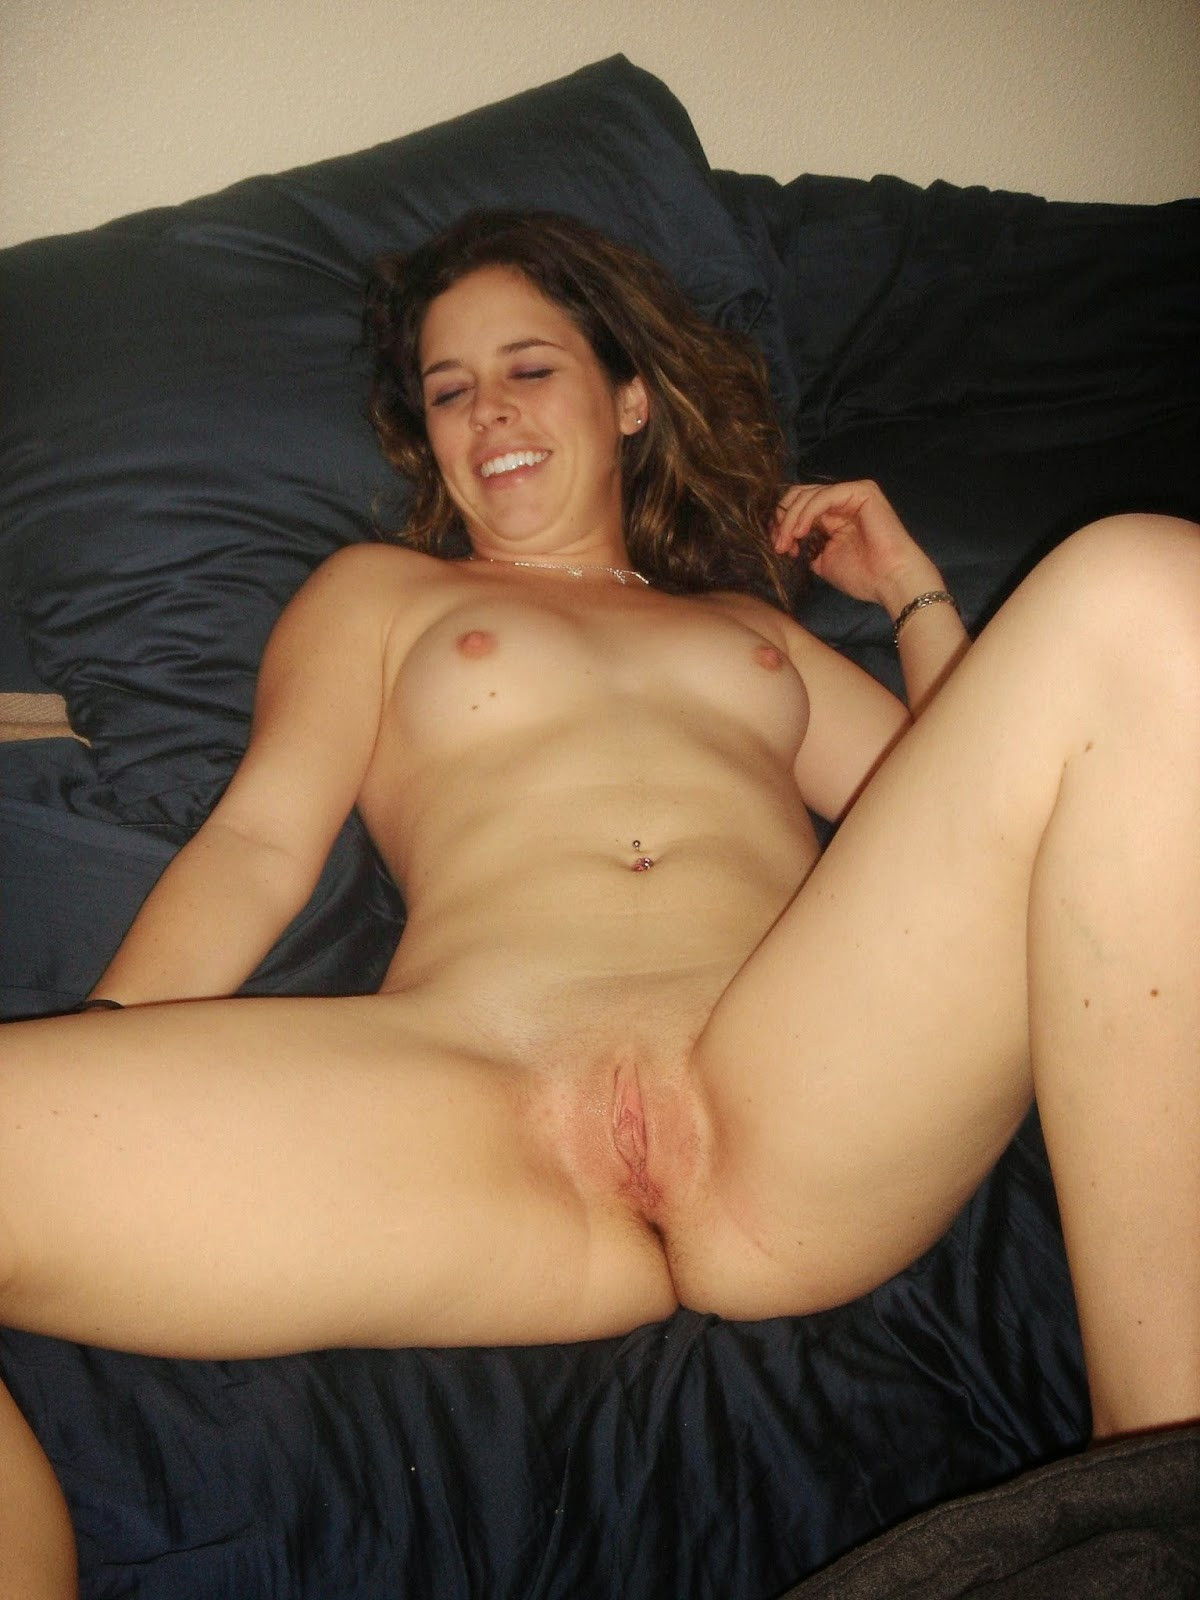 Mylie cyrus side boob shows